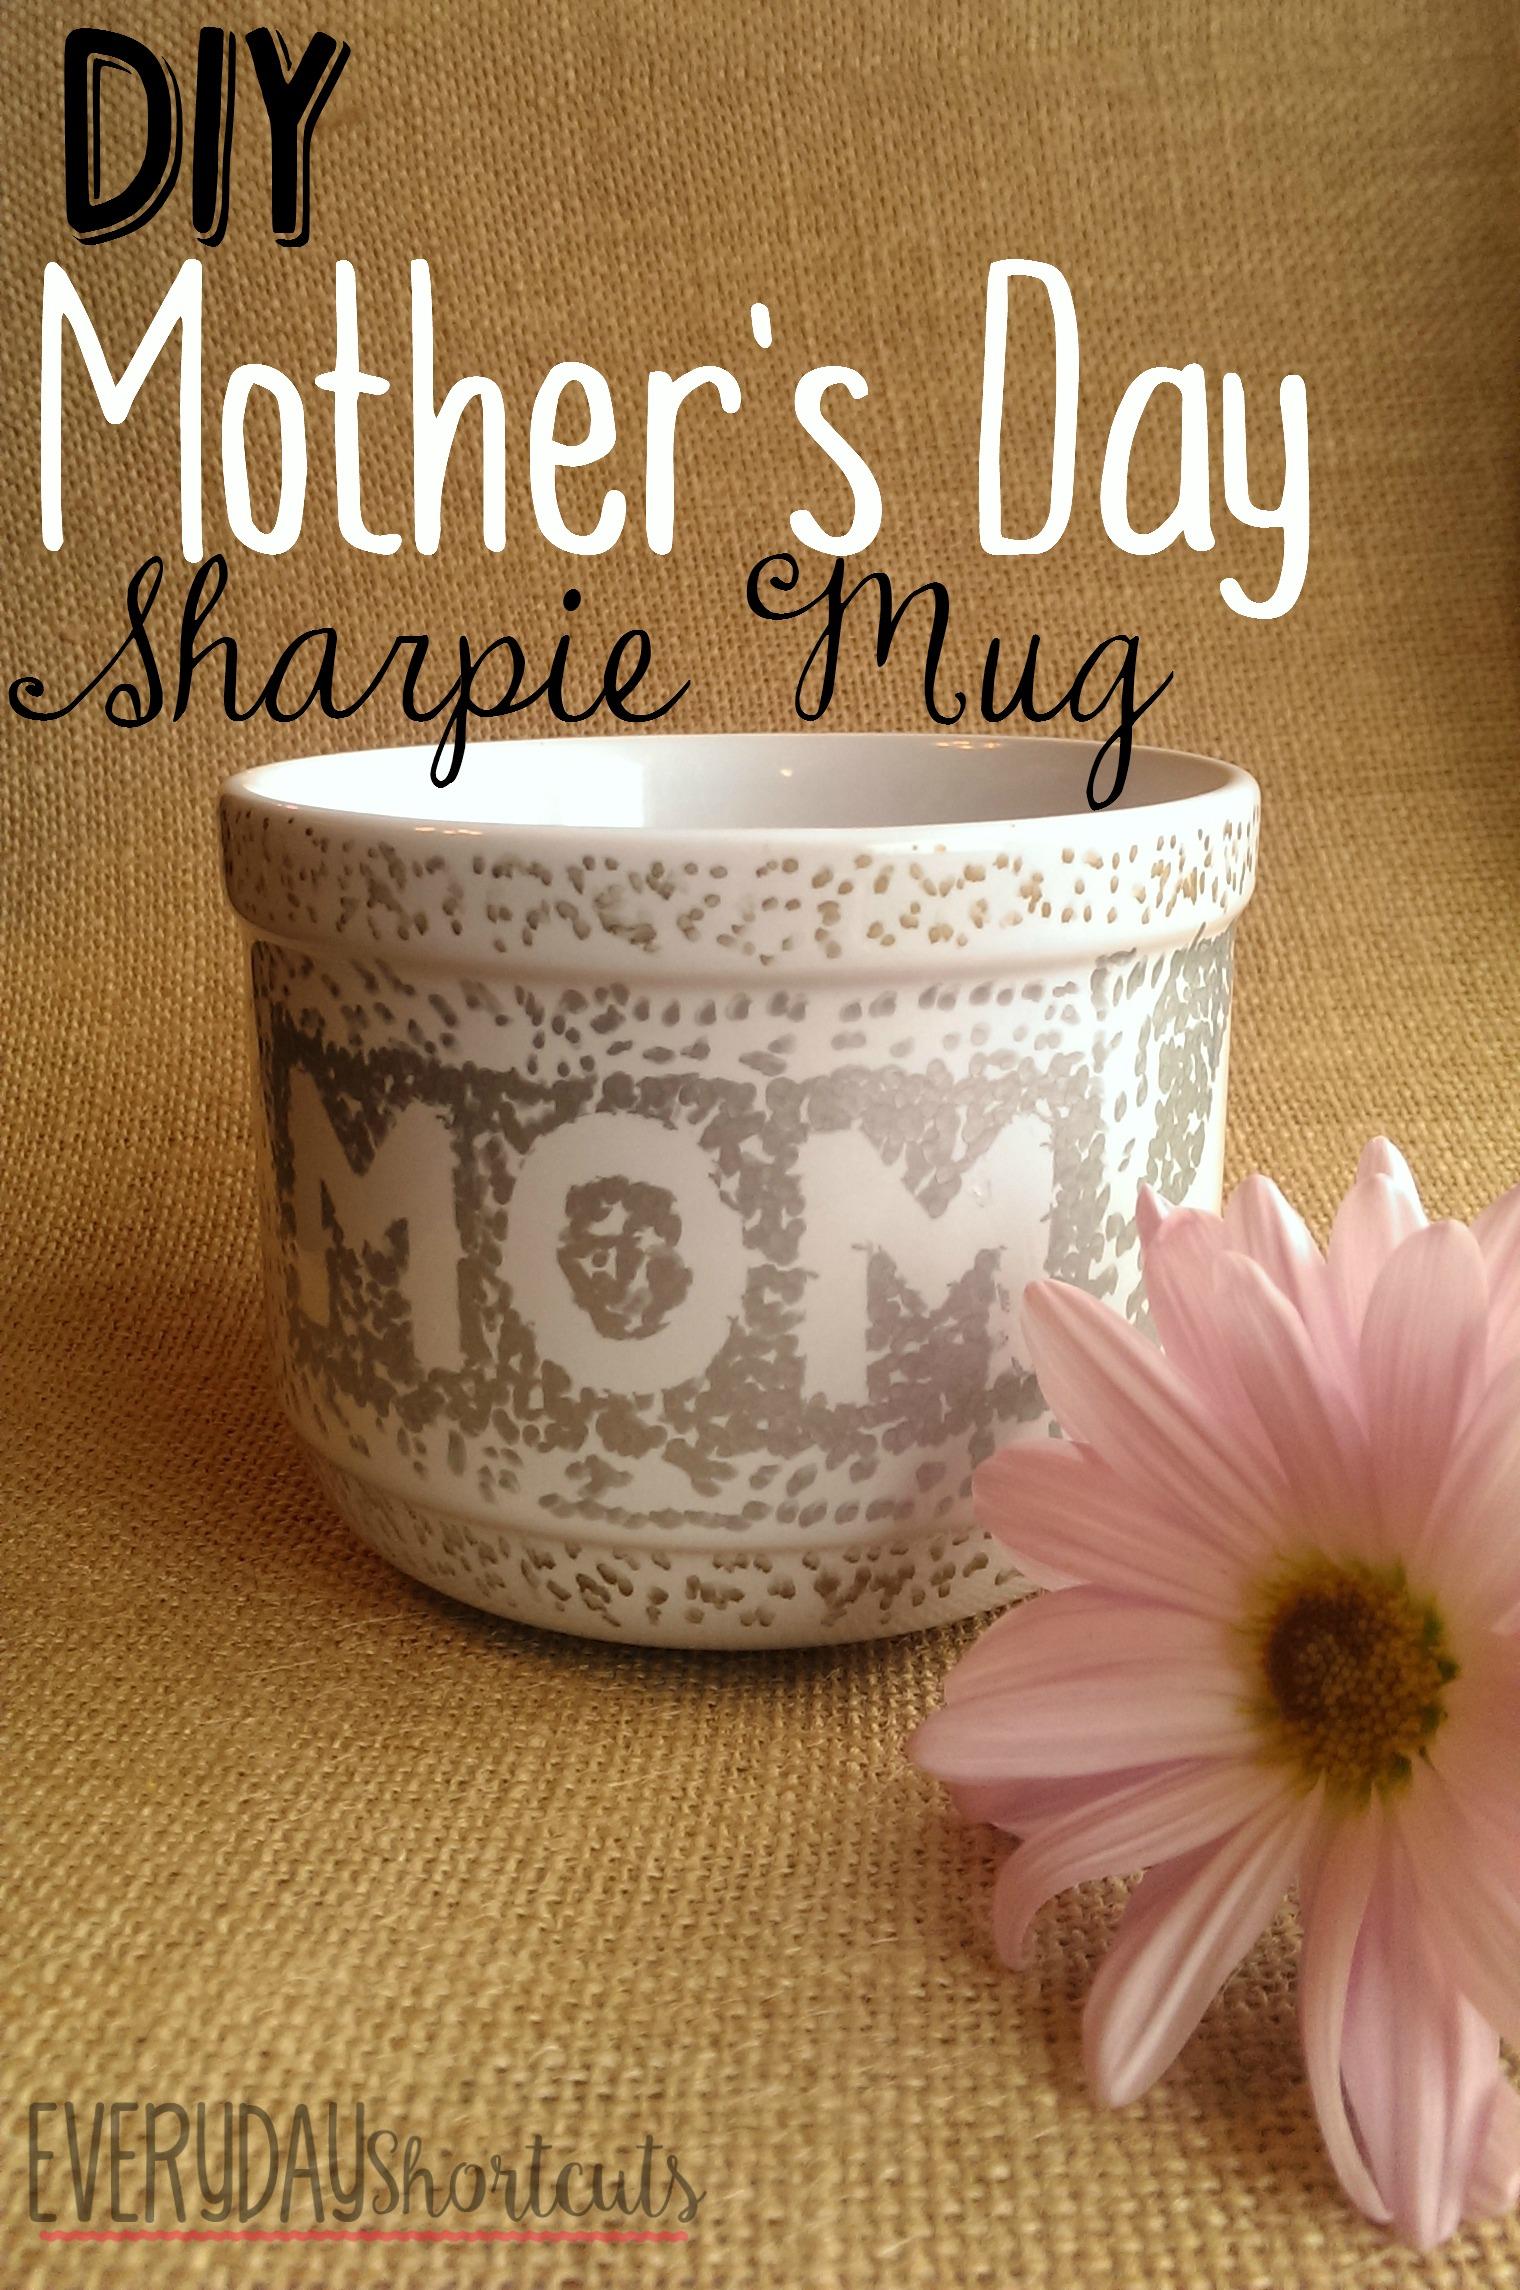 diy mother's day sharpie mug